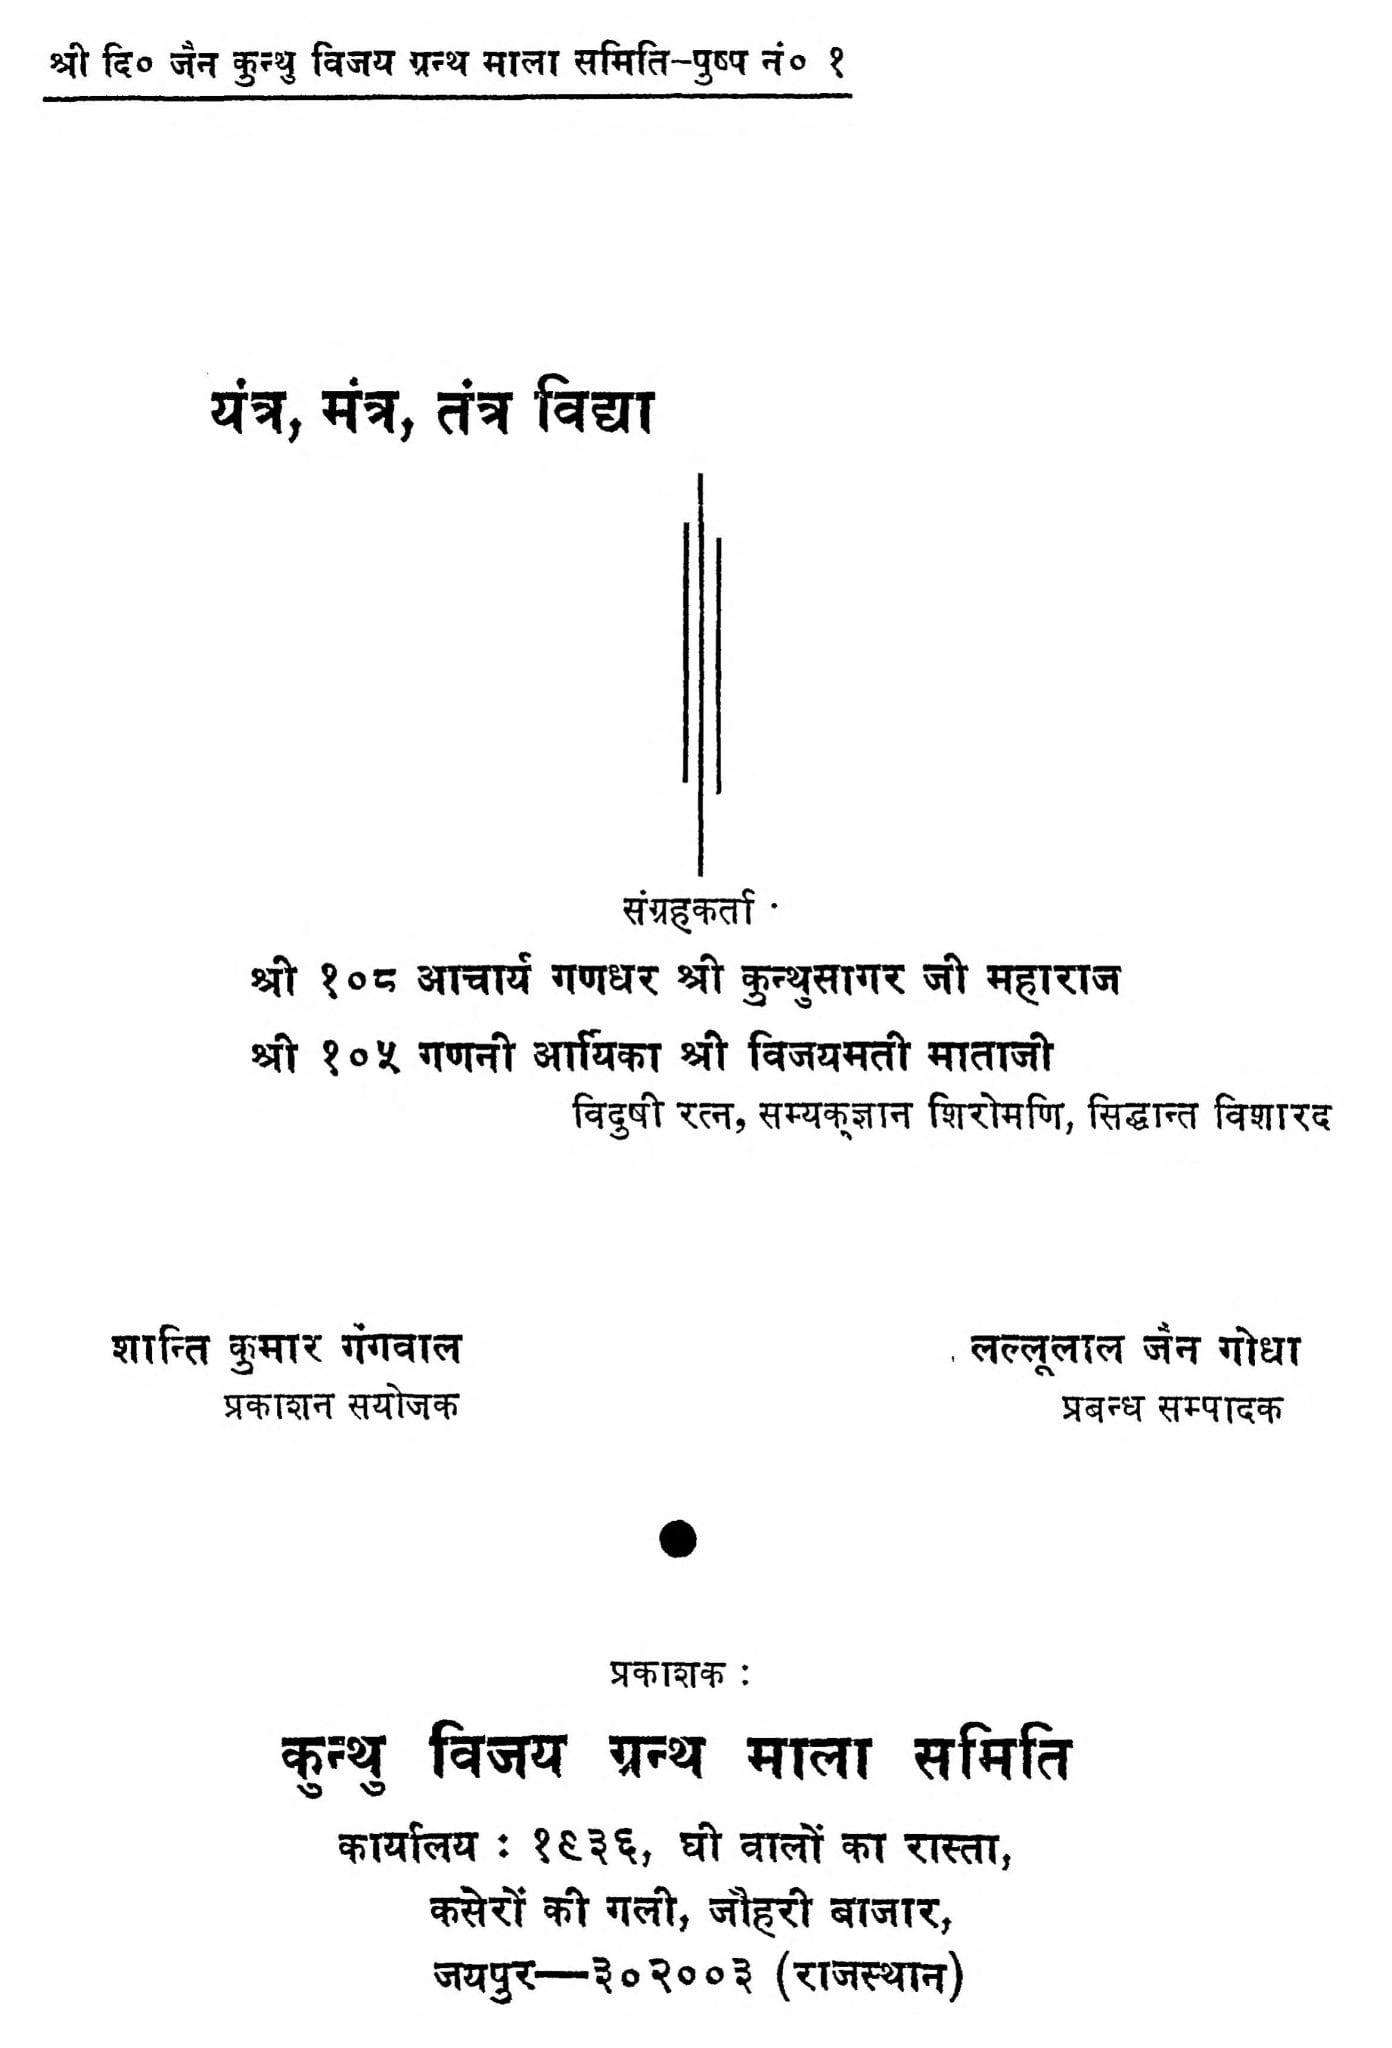 Yantra  Mantra Tantra Vidhya by श्री कुन्थु सागर जी महाराज - Shri Kunthu Sagar Ji Maharajश्री विजयमती माताजी - Shri Vijaymati Mataji